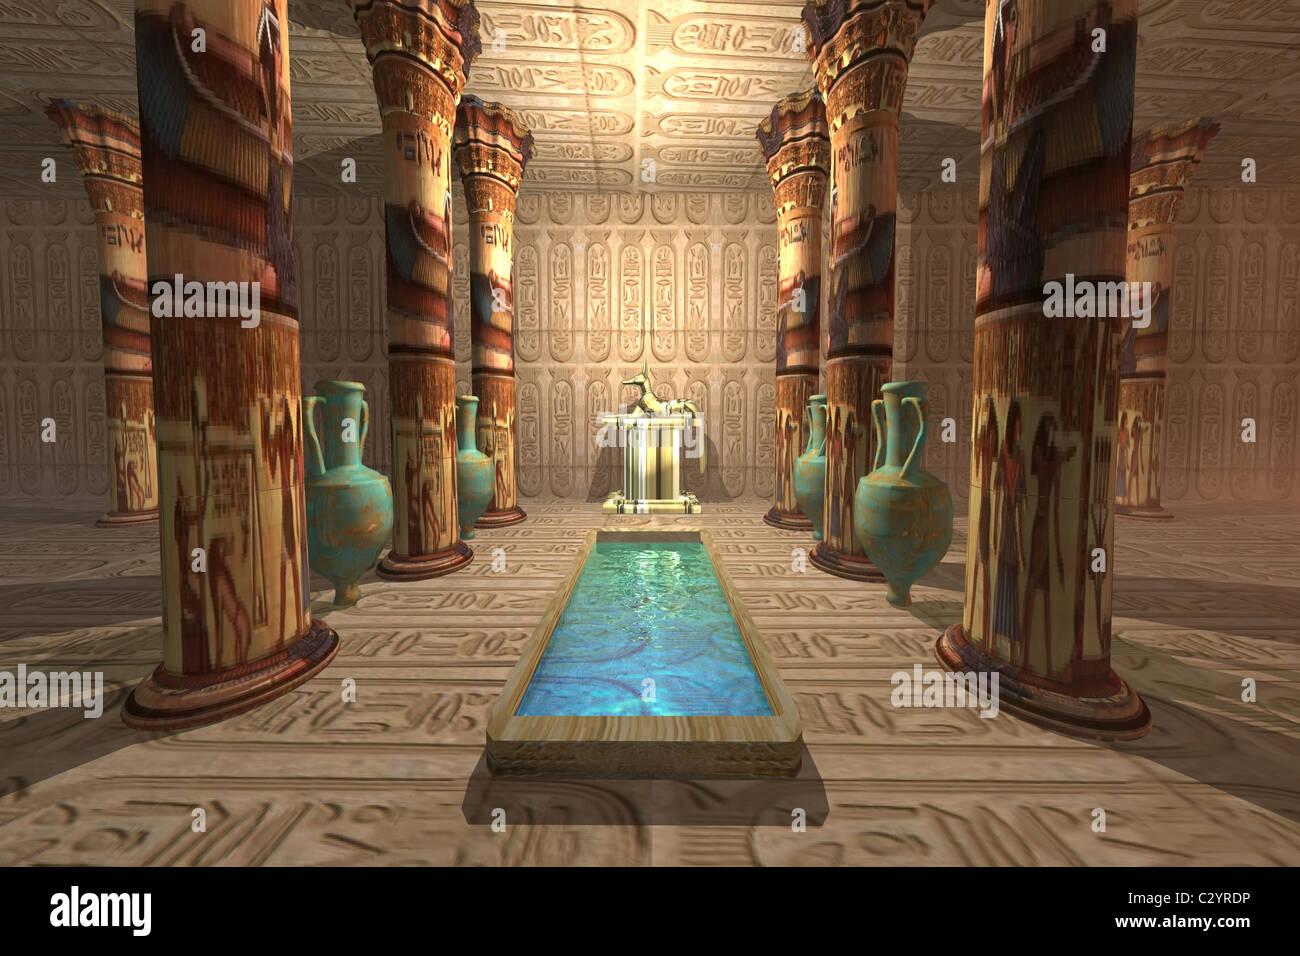 A temple to worship the Egyptian god Anubis Stock Photo